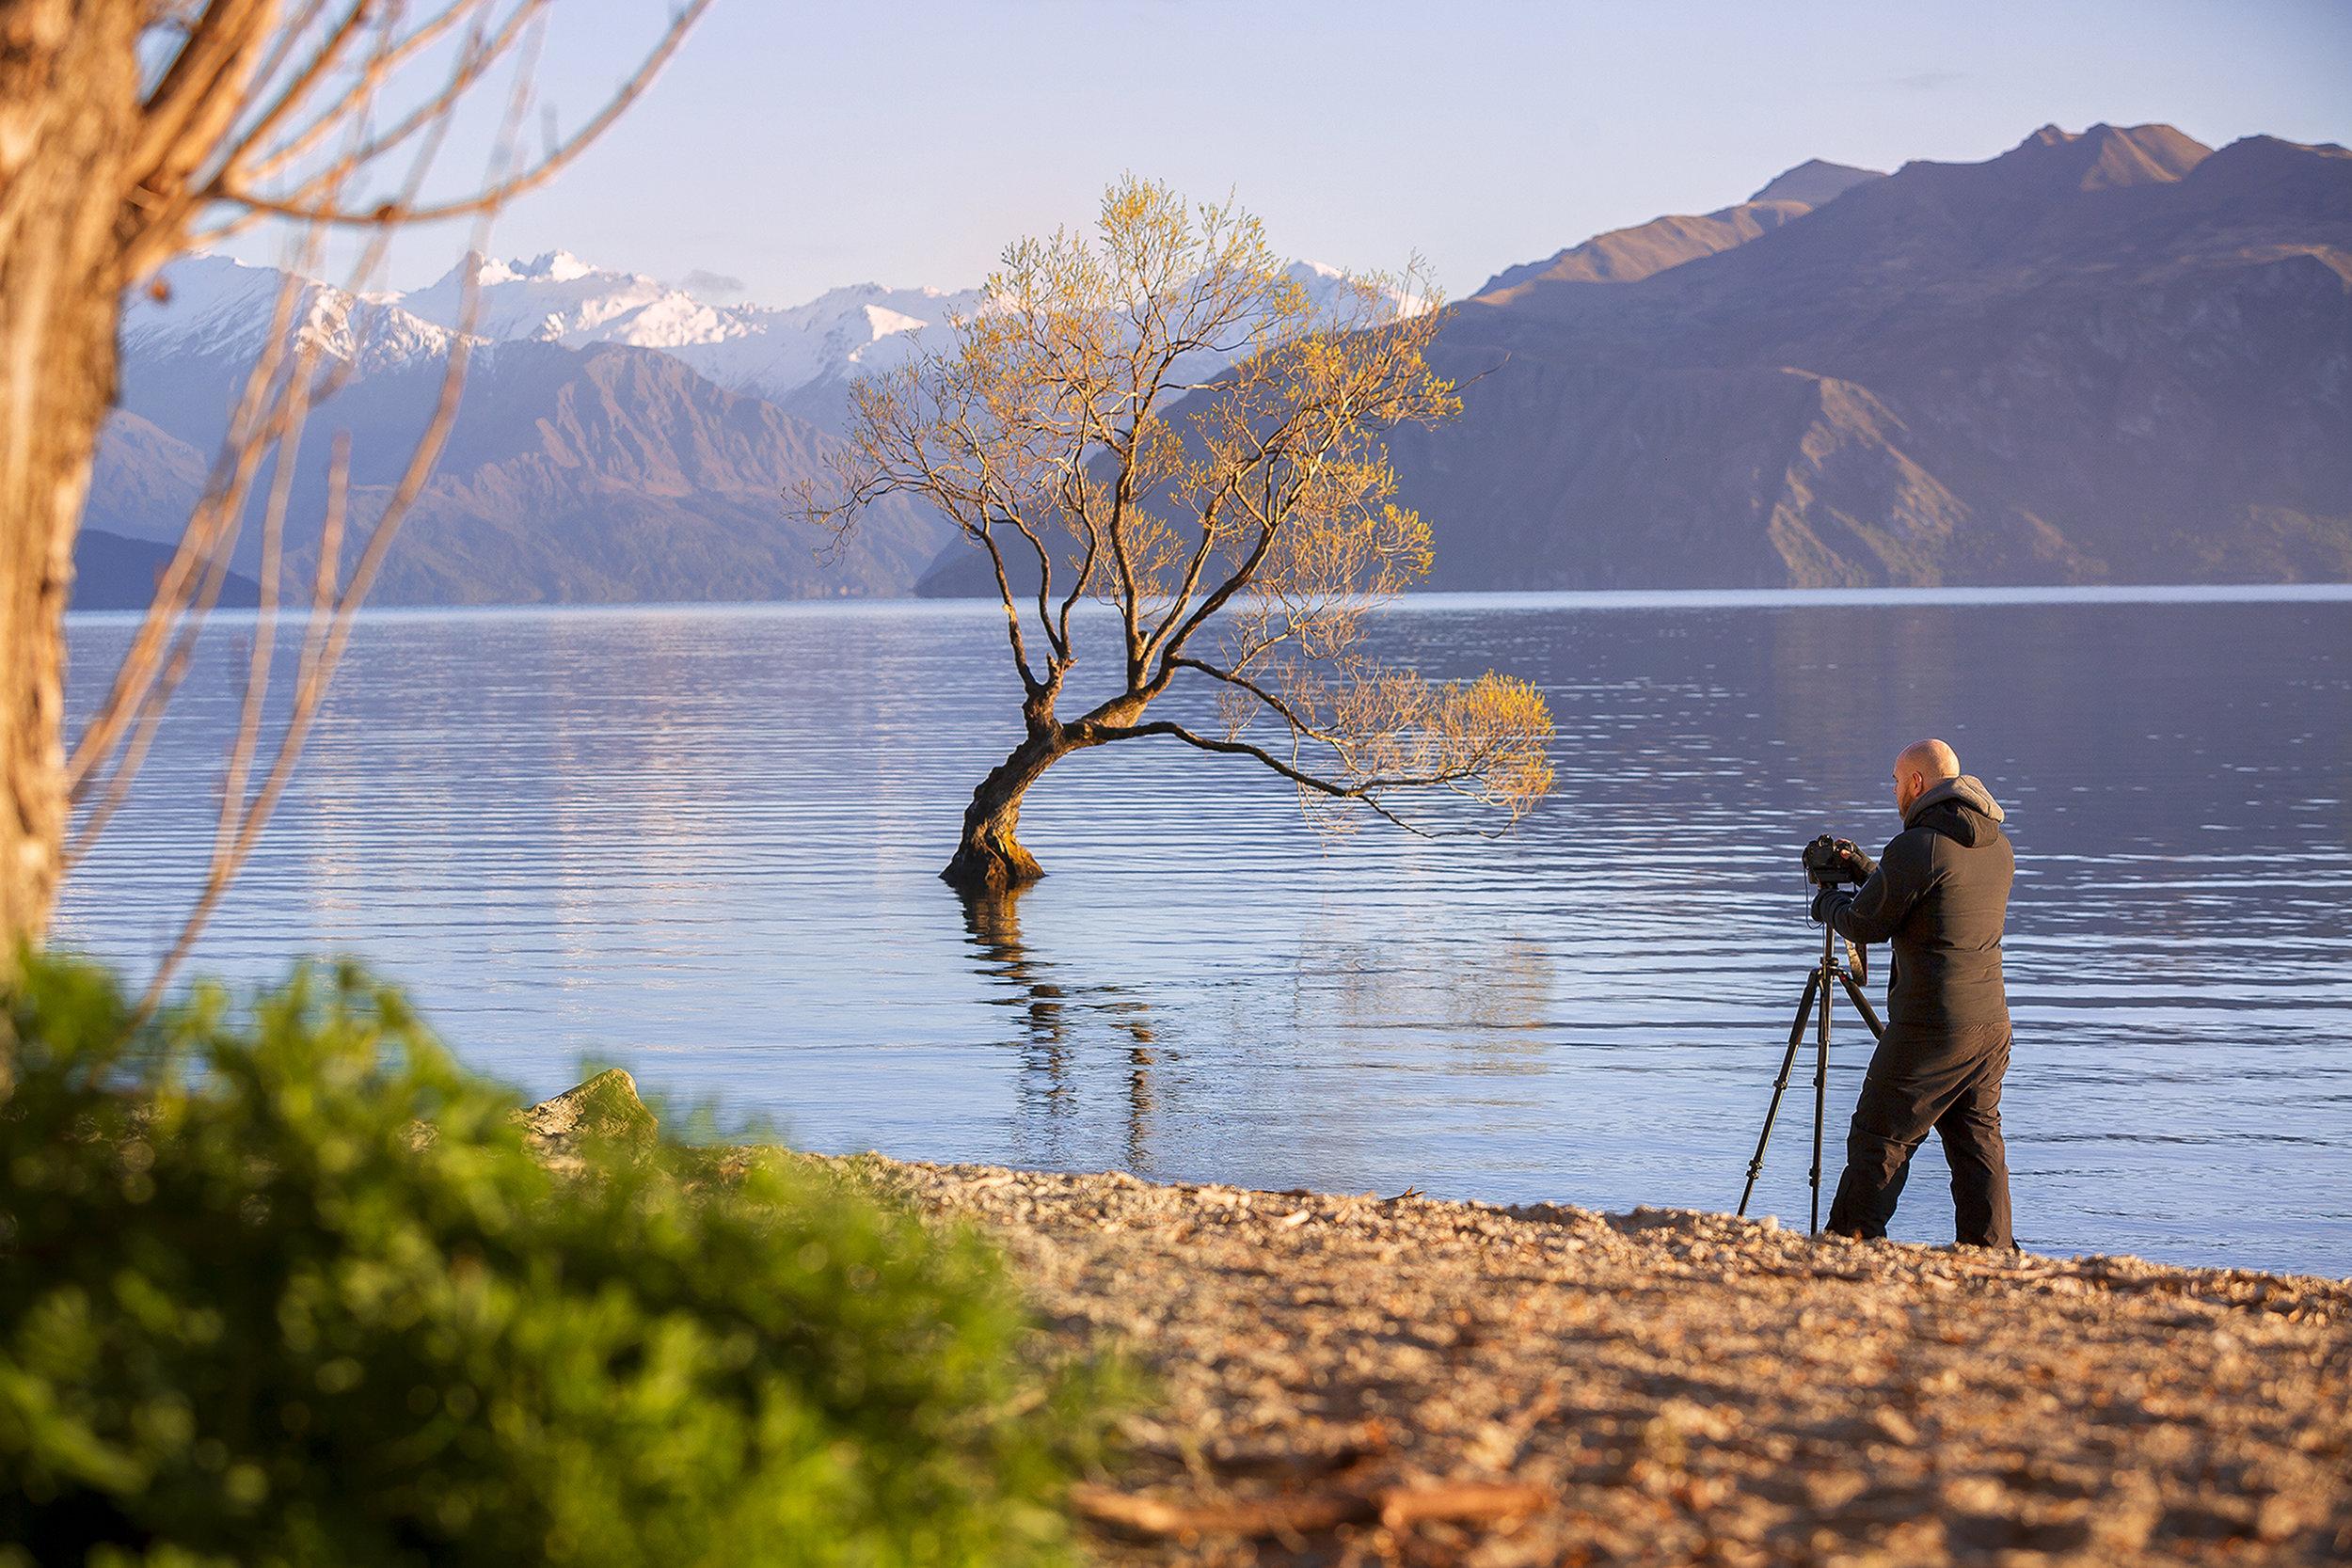 DK Photography 3 - Lake Wanaka.jpg